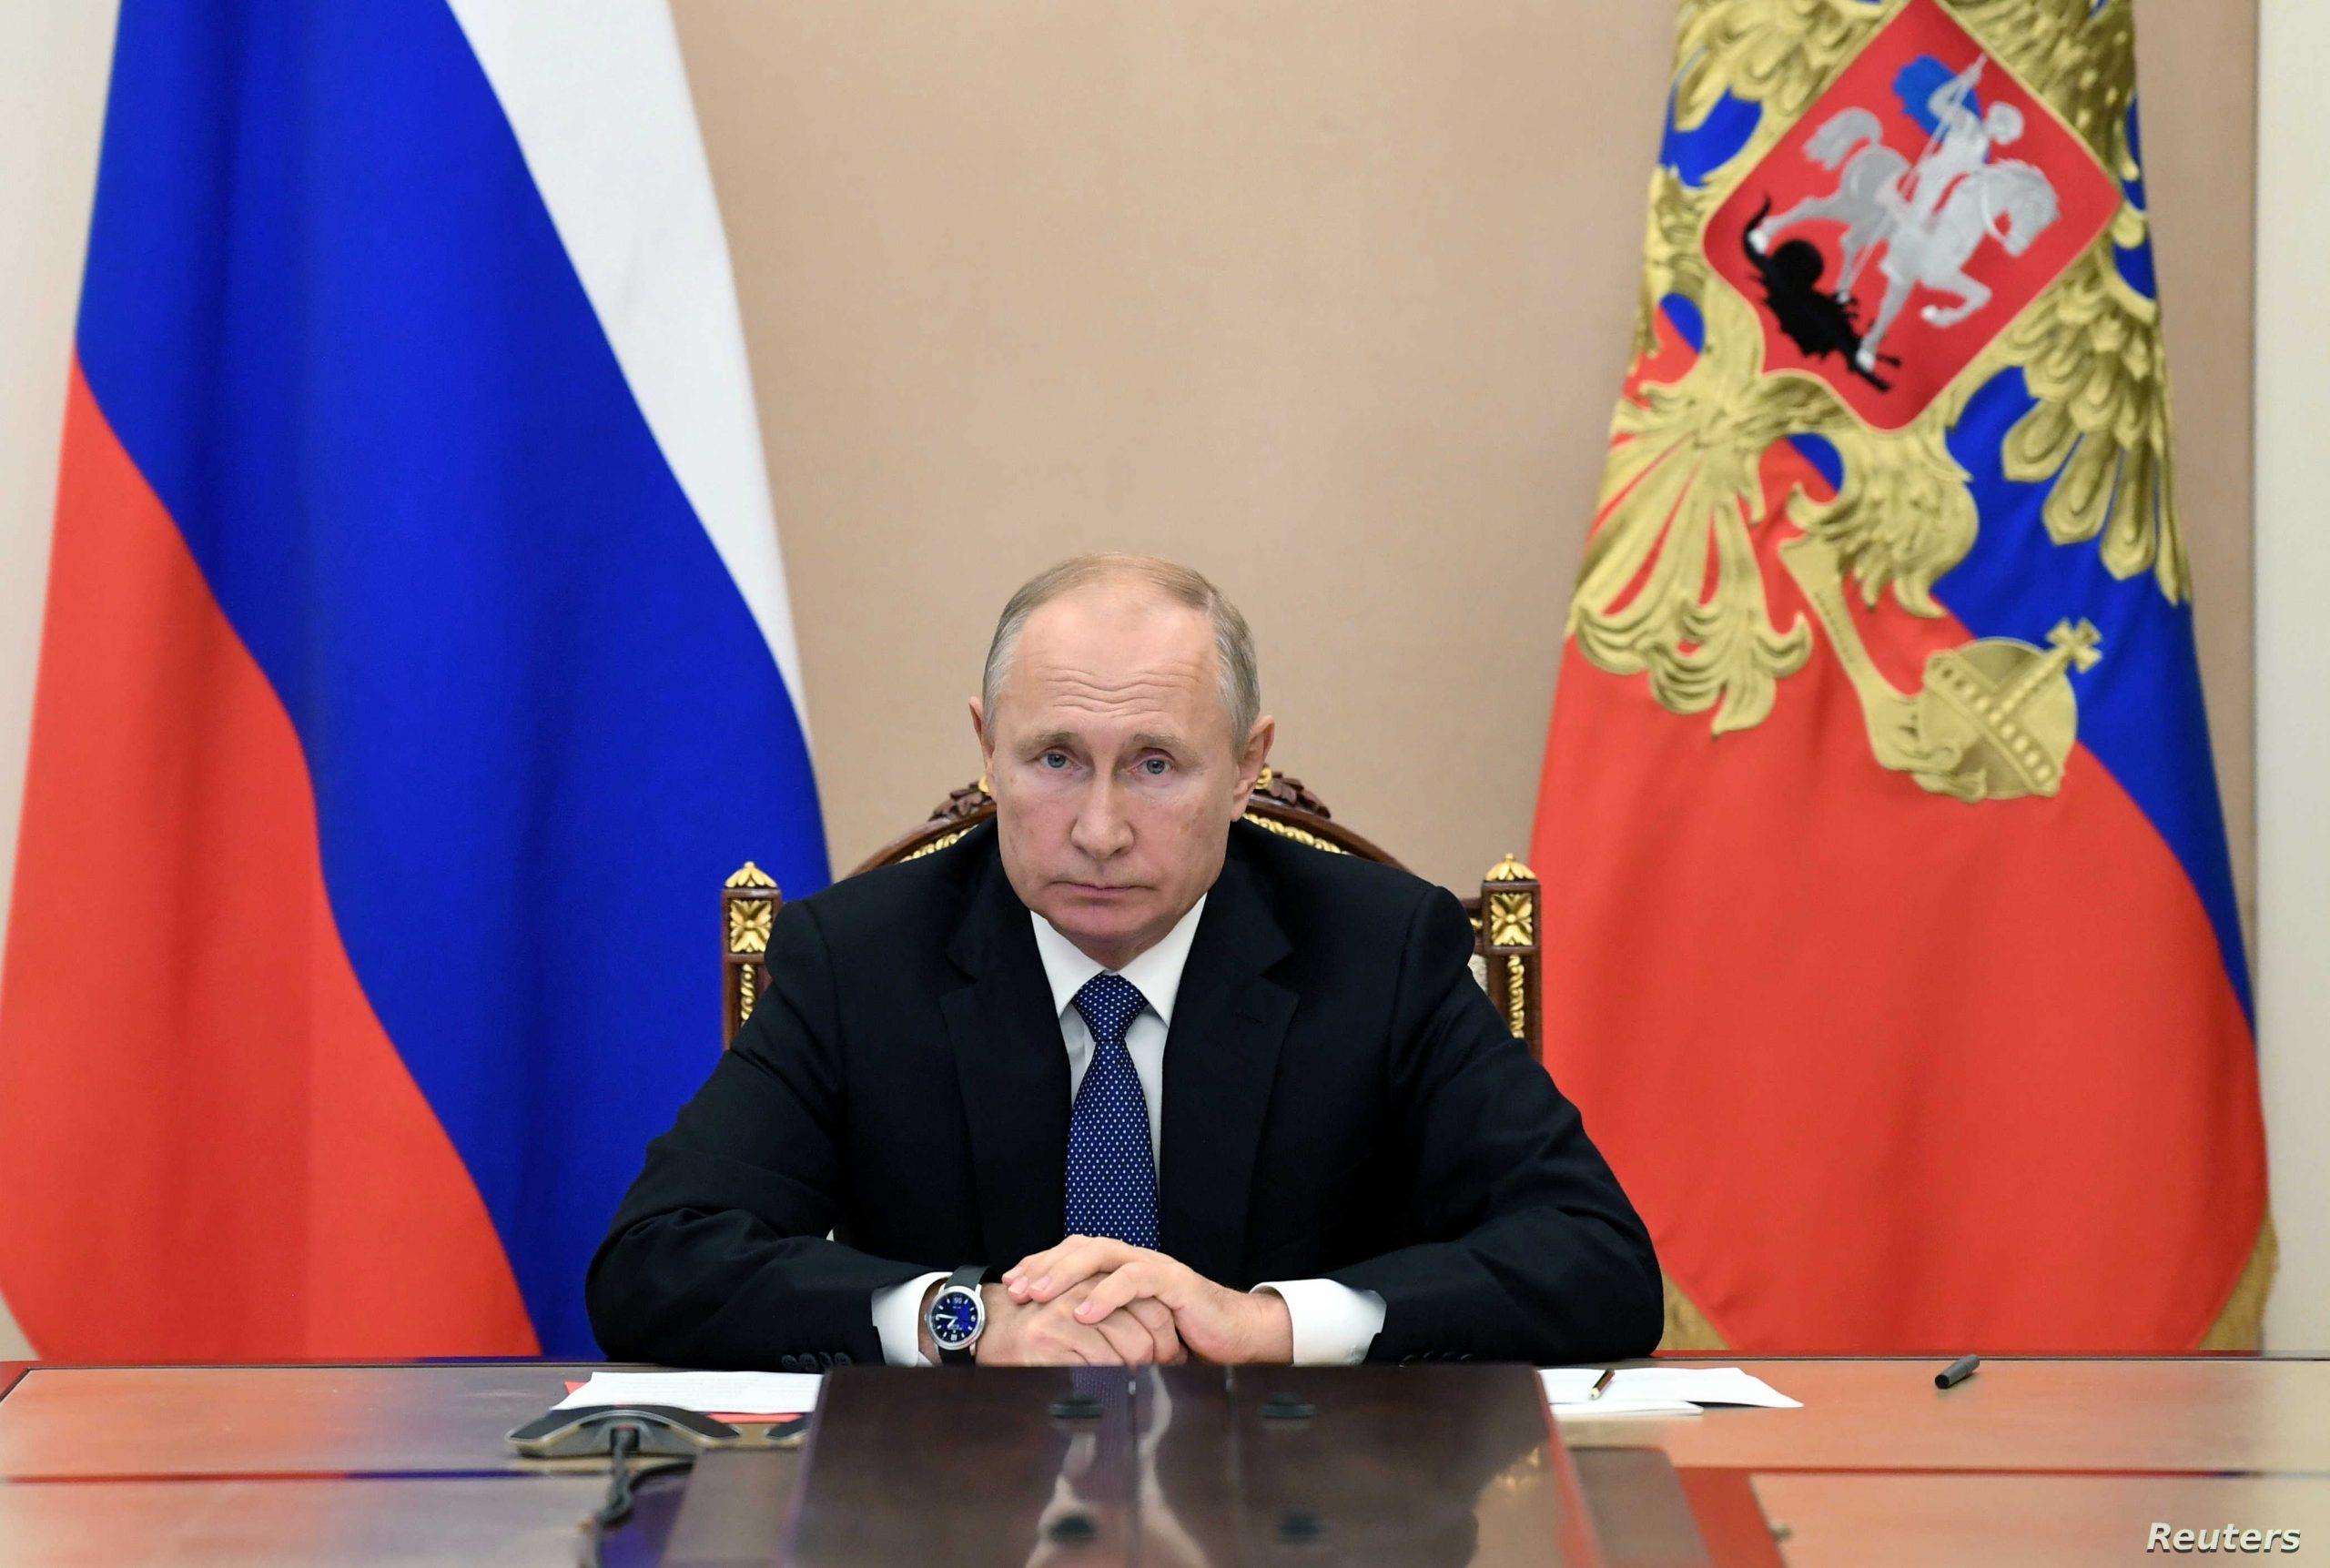 2020 11 06T114746Z 1350053939 RC2NXJ97B0EY RTRMADP 3 RUSSIA PUTIN scaled